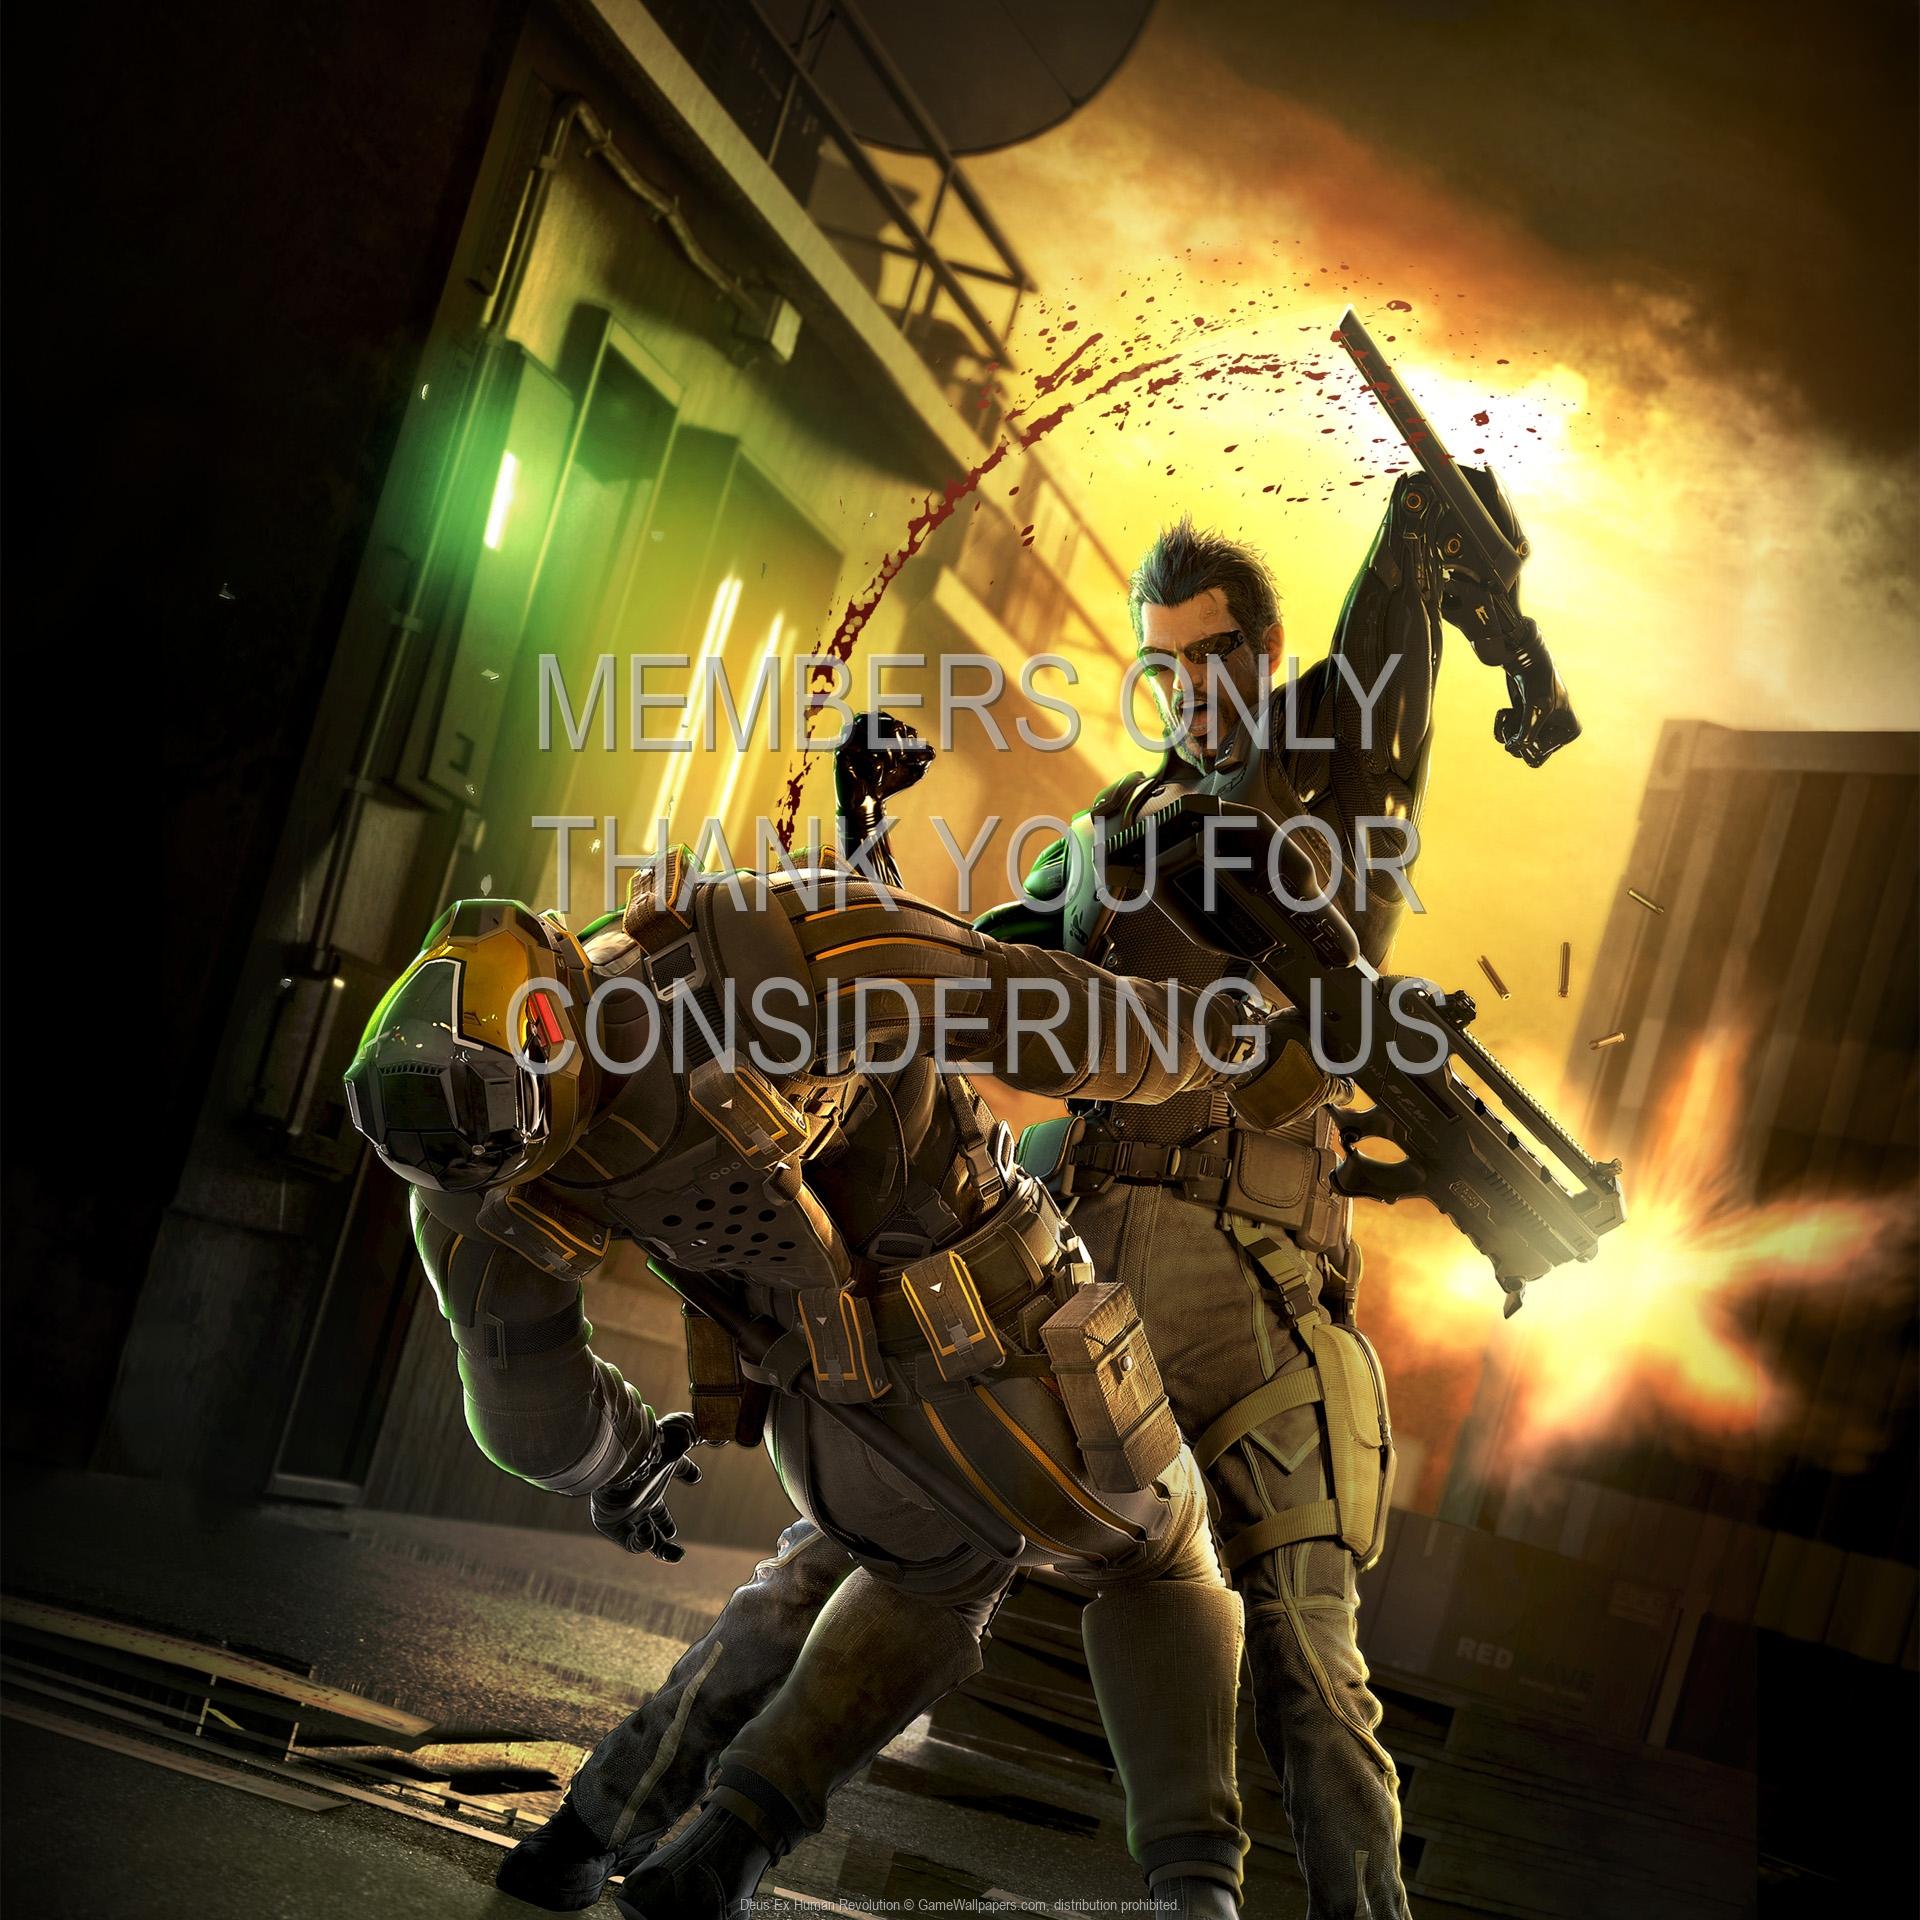 Deus Ex: Human Revolution 1920x1080 Handy Hintergrundbild 11